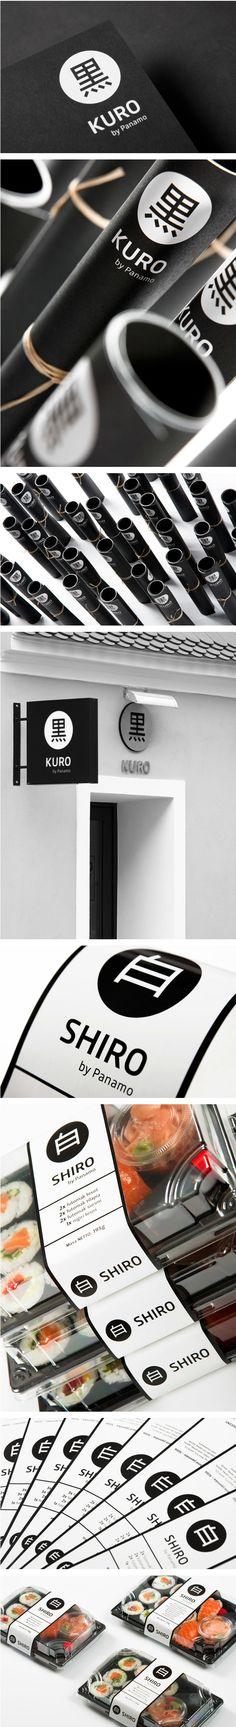 Kuro & Shiro on Behance. It's sushi for lunch identity packaging branding PD